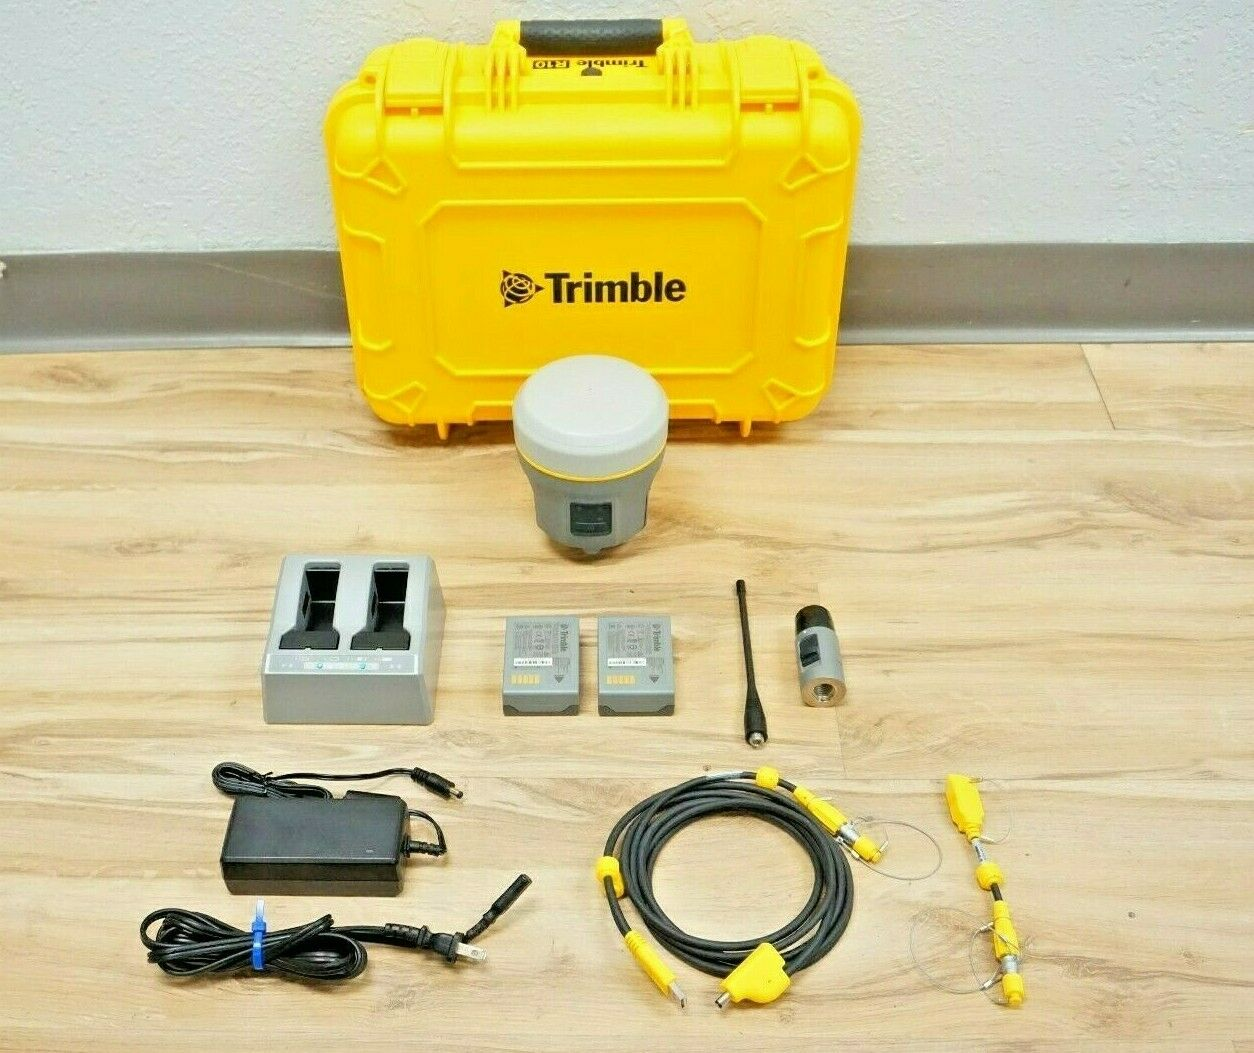 Trimble R10 L1 L2 L2c L5 GPS Glonass Galileo Compass xFill Base or Rover M1 V2